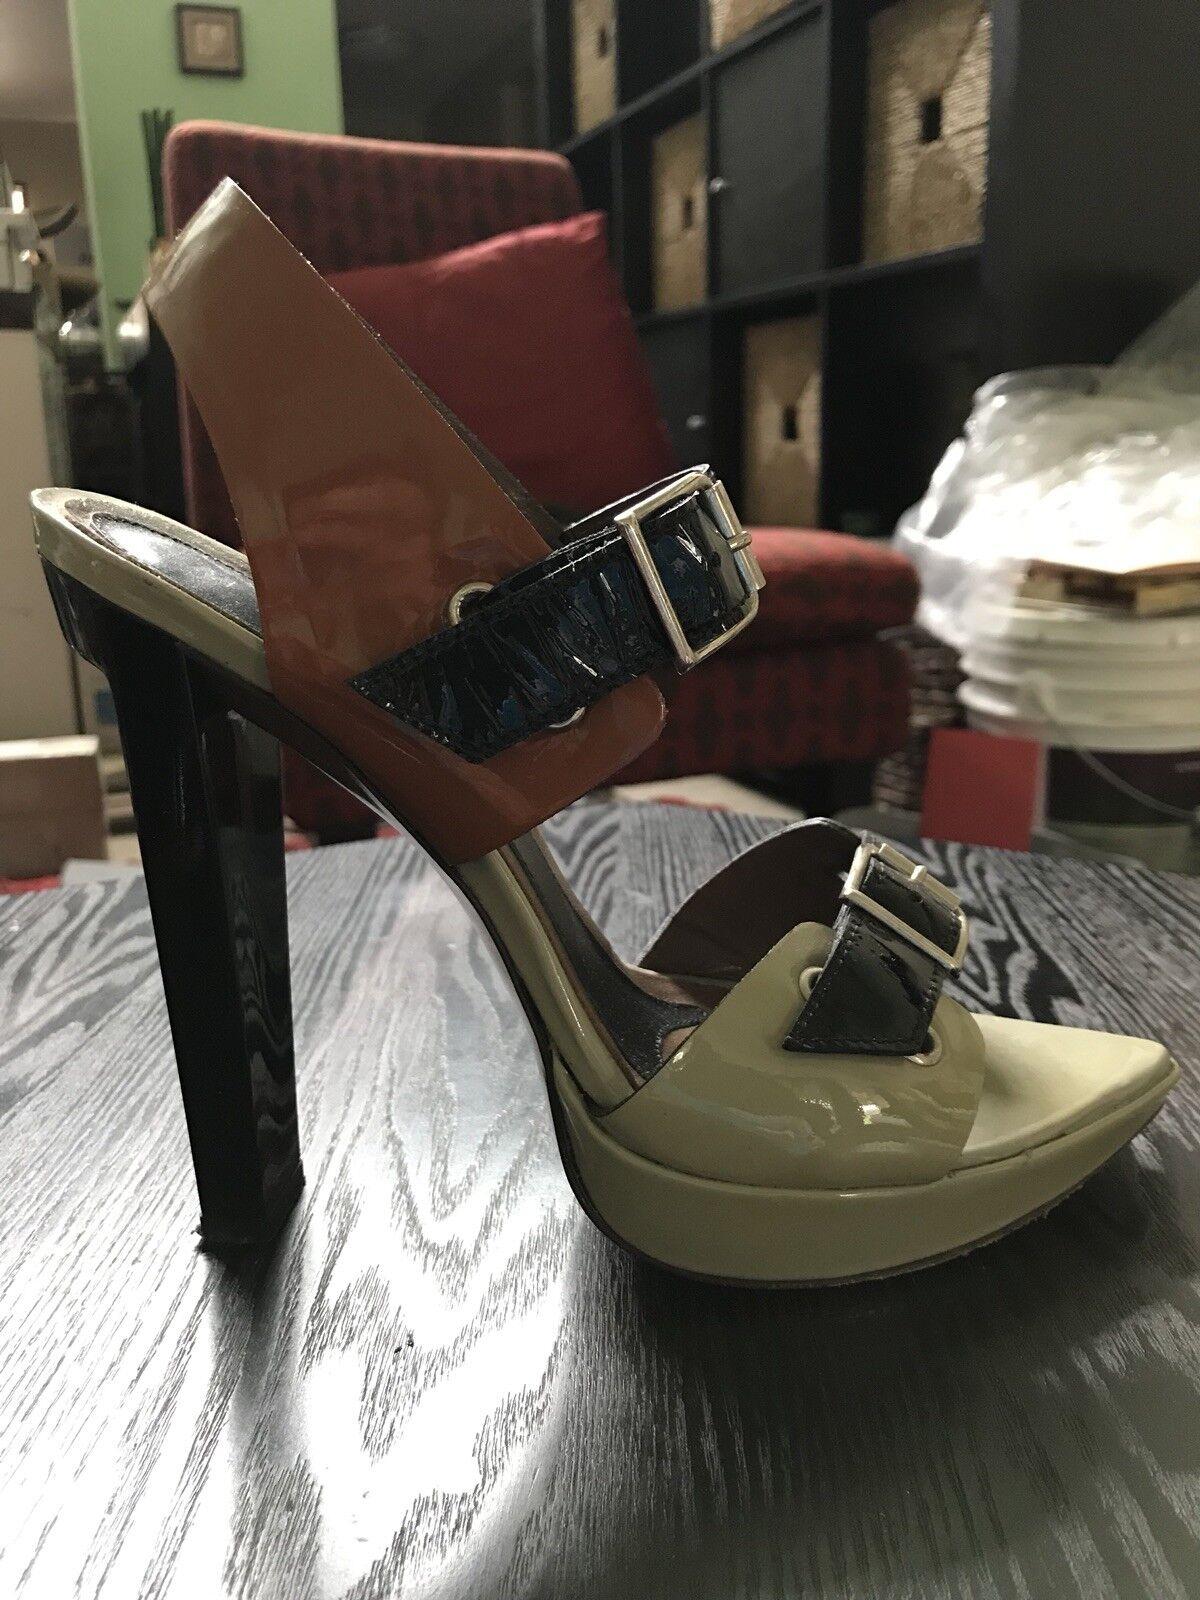 890 Stunning MARNI Tri-color Patent Leather Brown Platform Heels Buckles 38